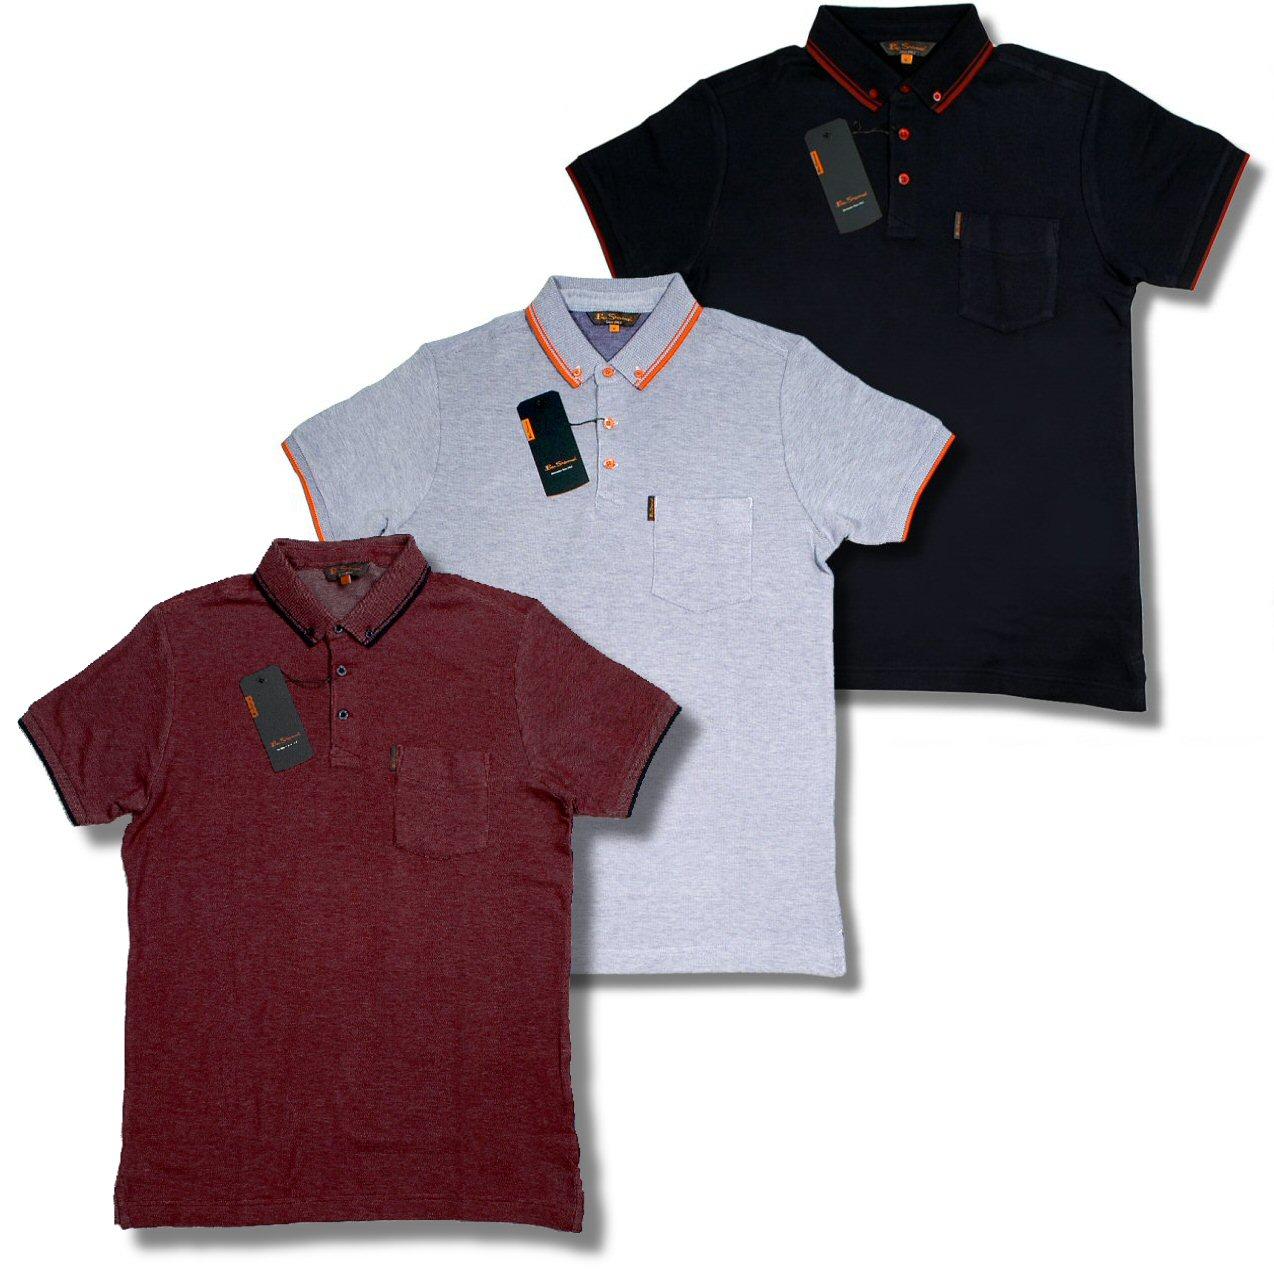 ben sherman mod pique tipped button down polo shirt adaptor clothing. Black Bedroom Furniture Sets. Home Design Ideas